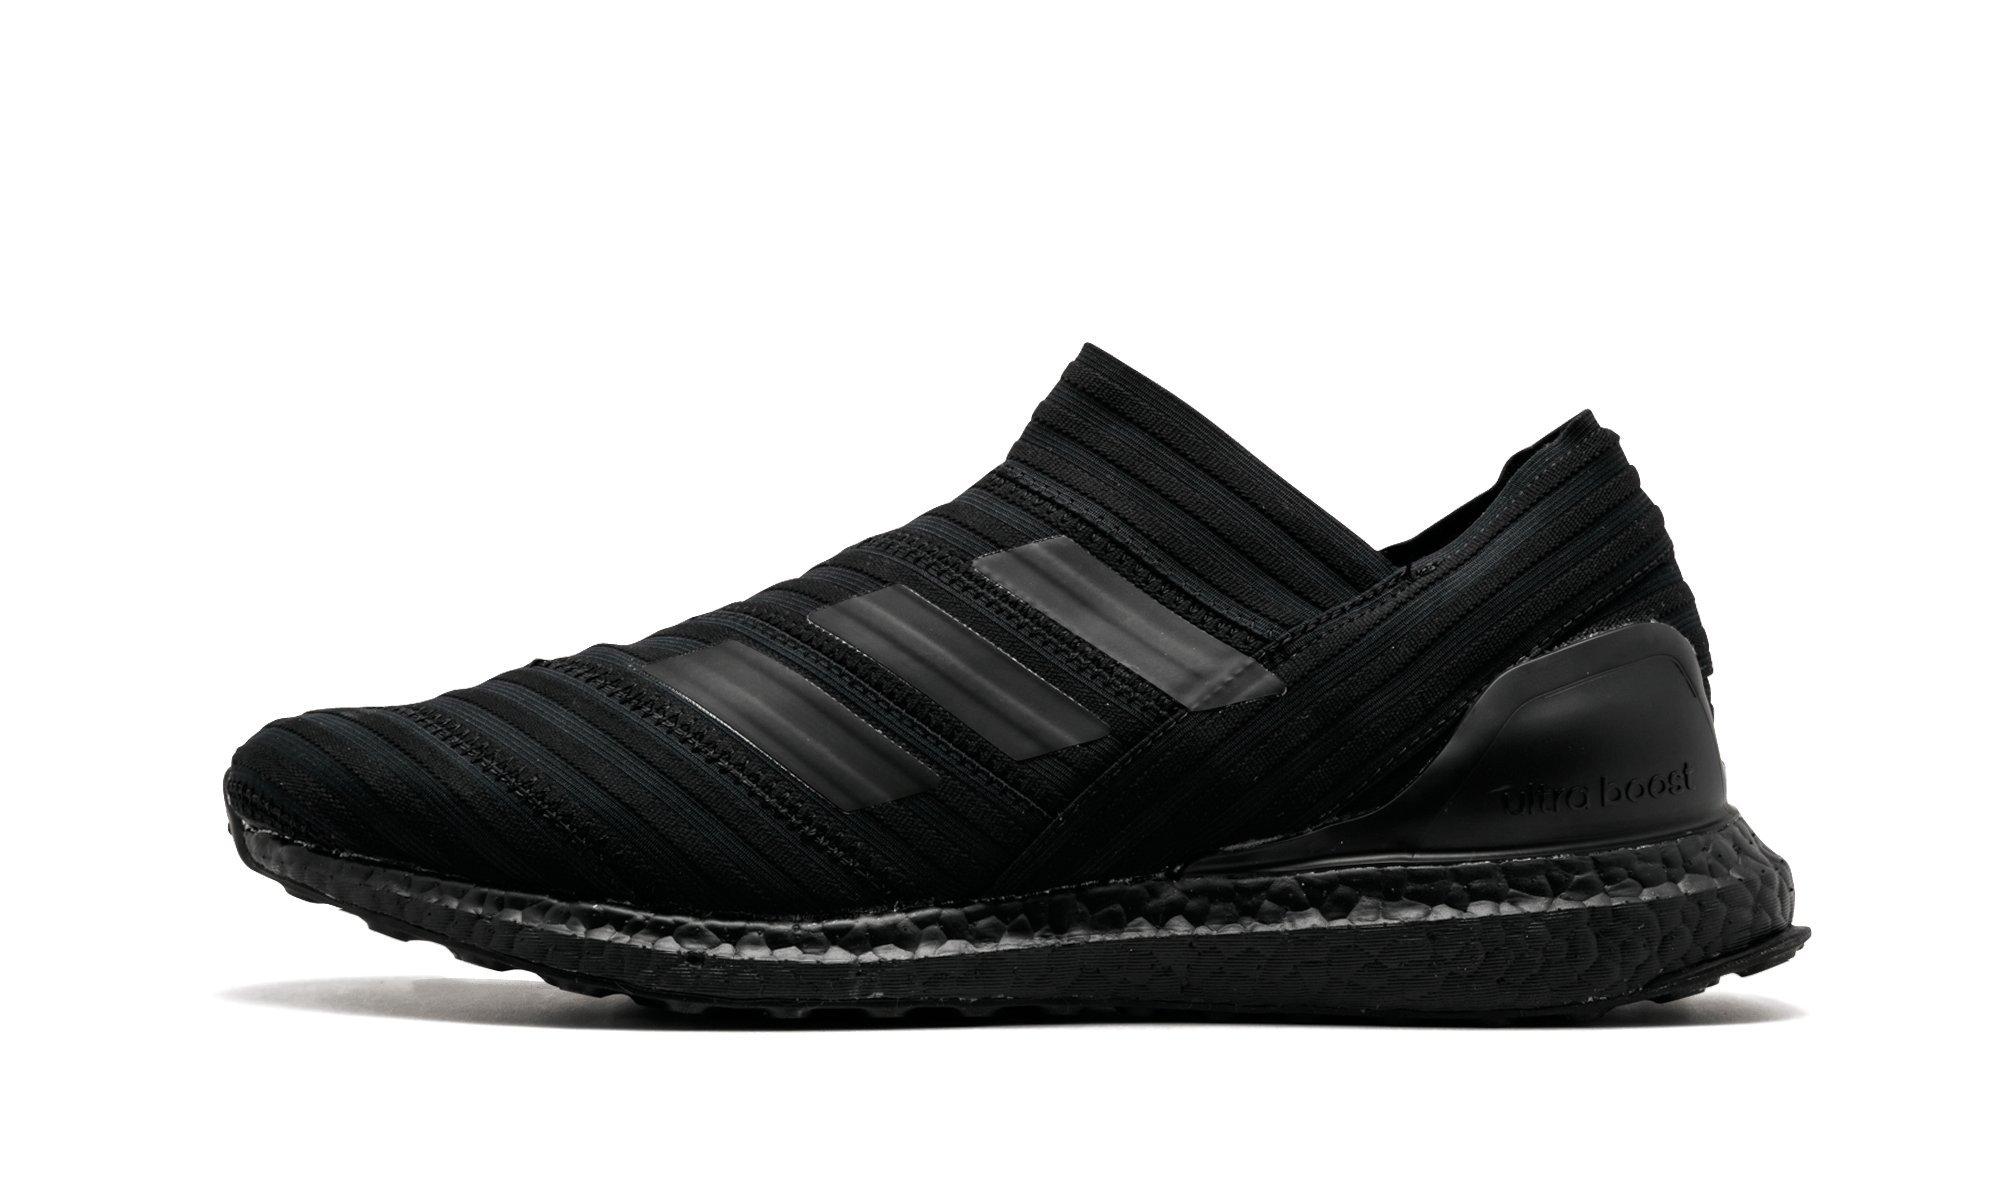 Adidas Nemeziz Tango 17+ 360Agili - US 10 by adidas